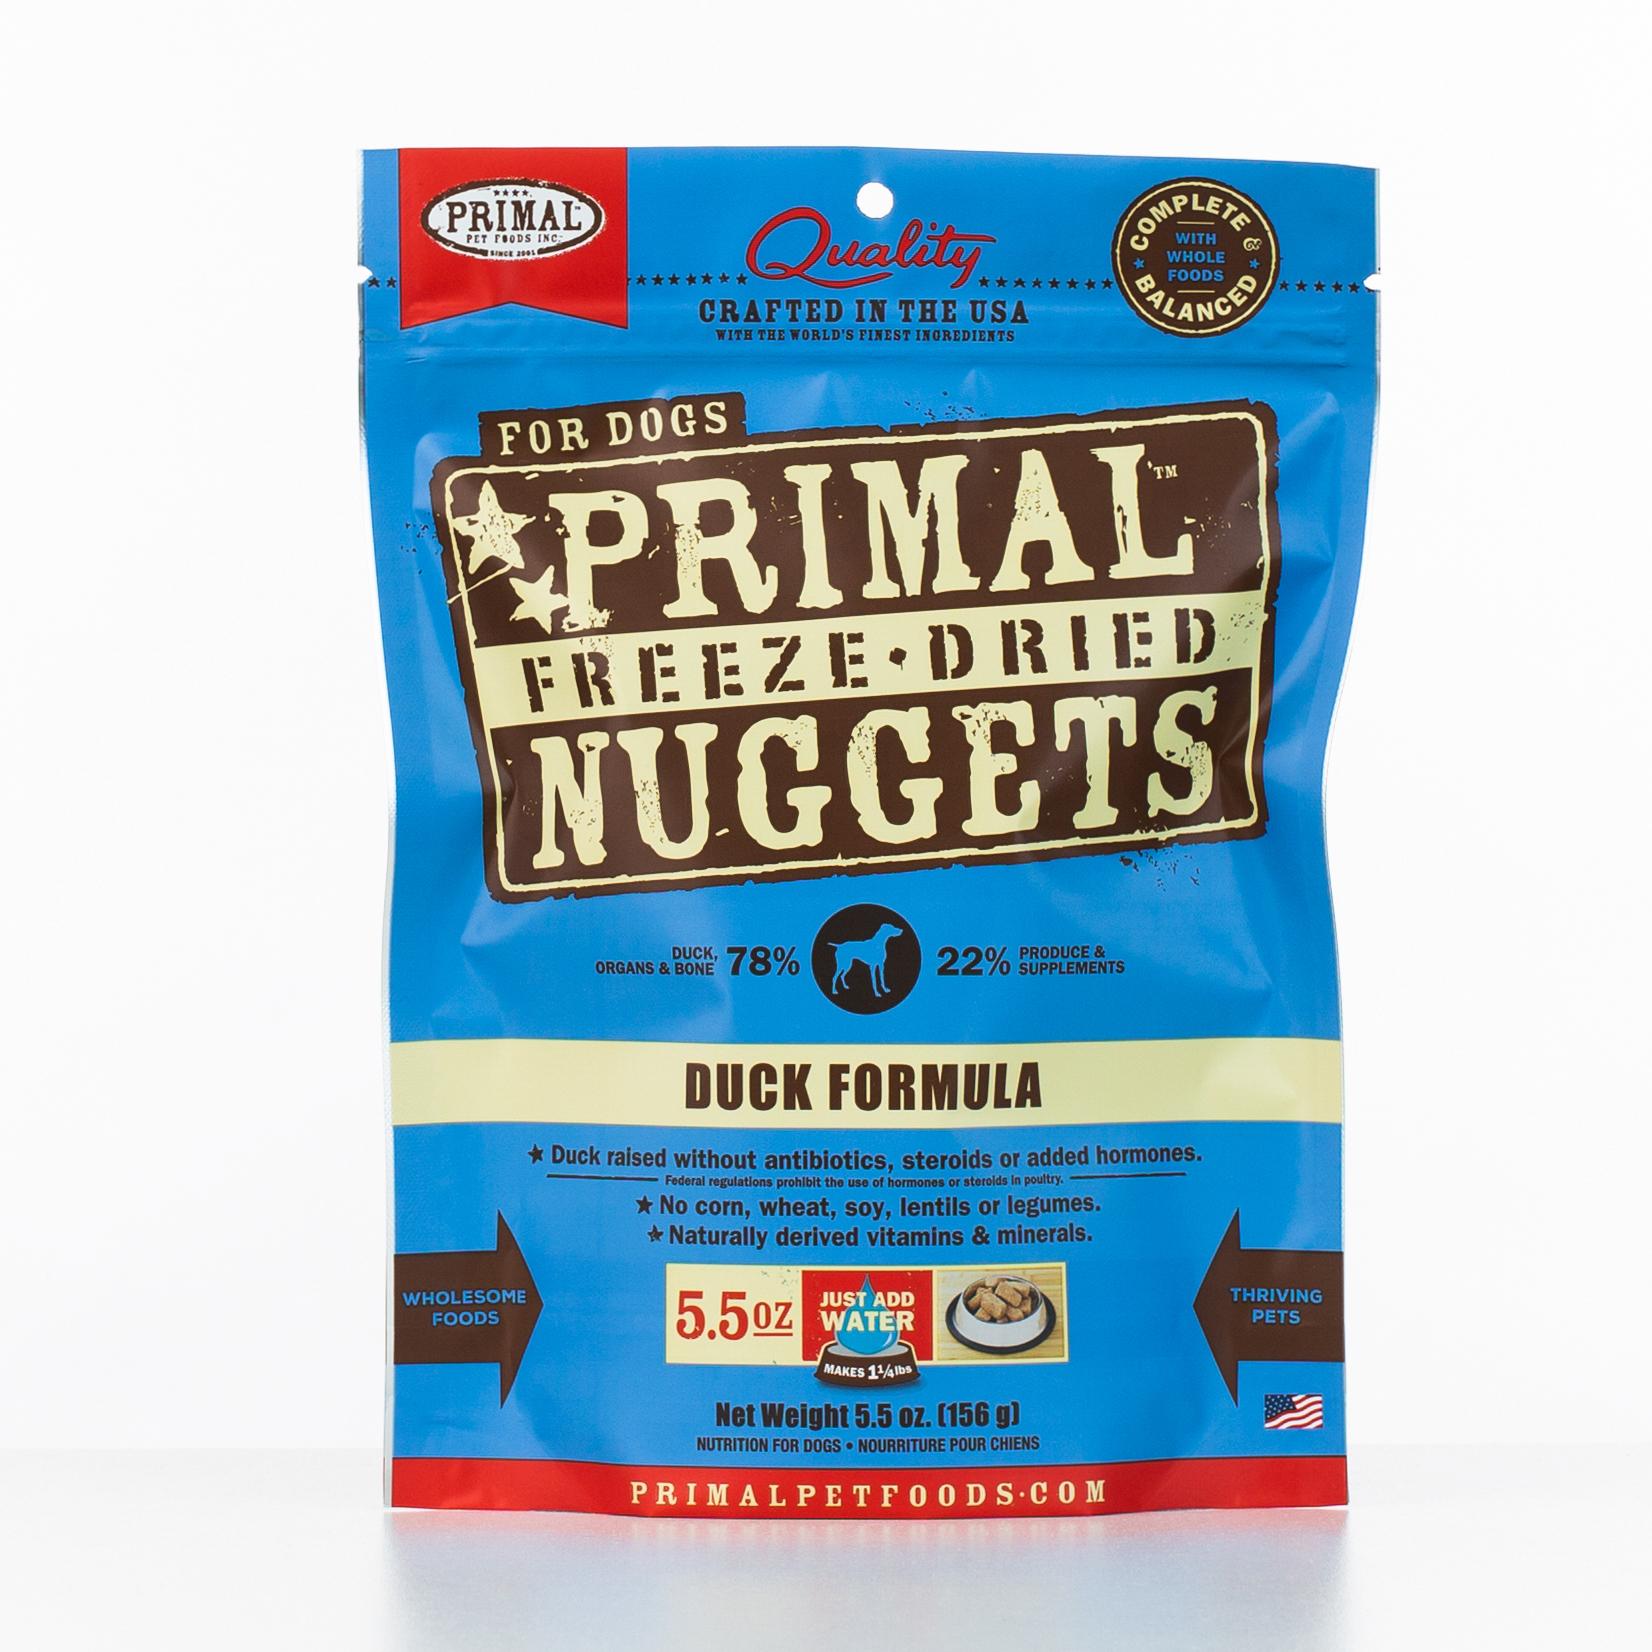 Primal Raw Freeze-Dried Nuggets Duck Formula Dog Food, 5.5-oz bag